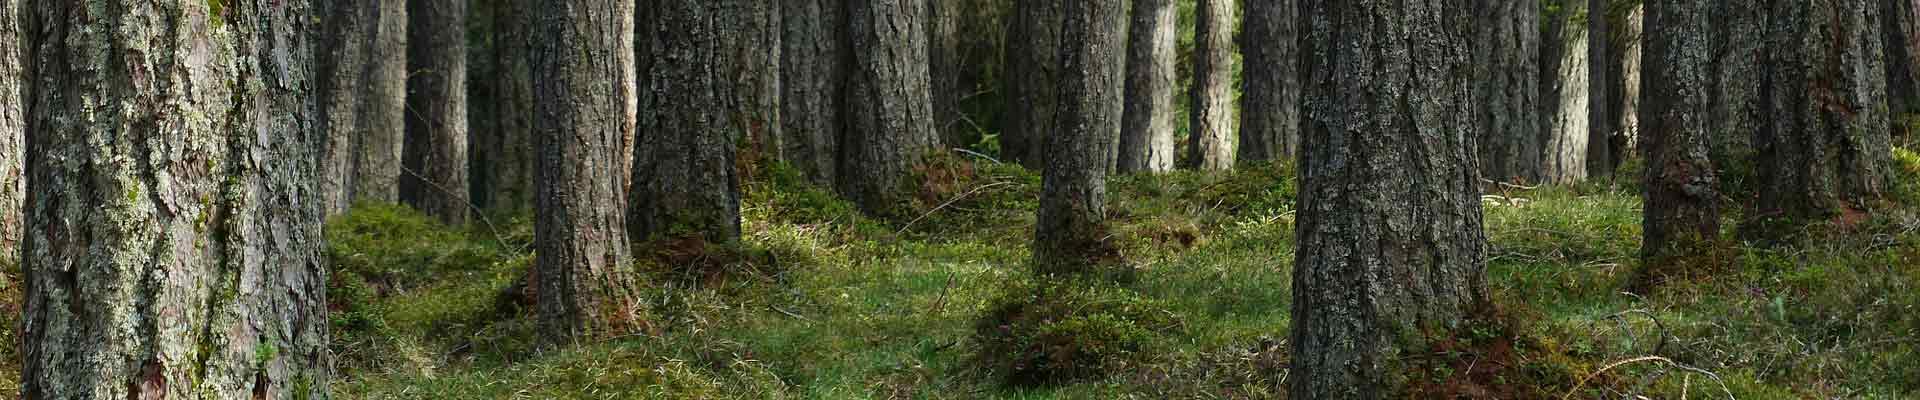 Spécialistes du Grupo Gámiz en bois de pin